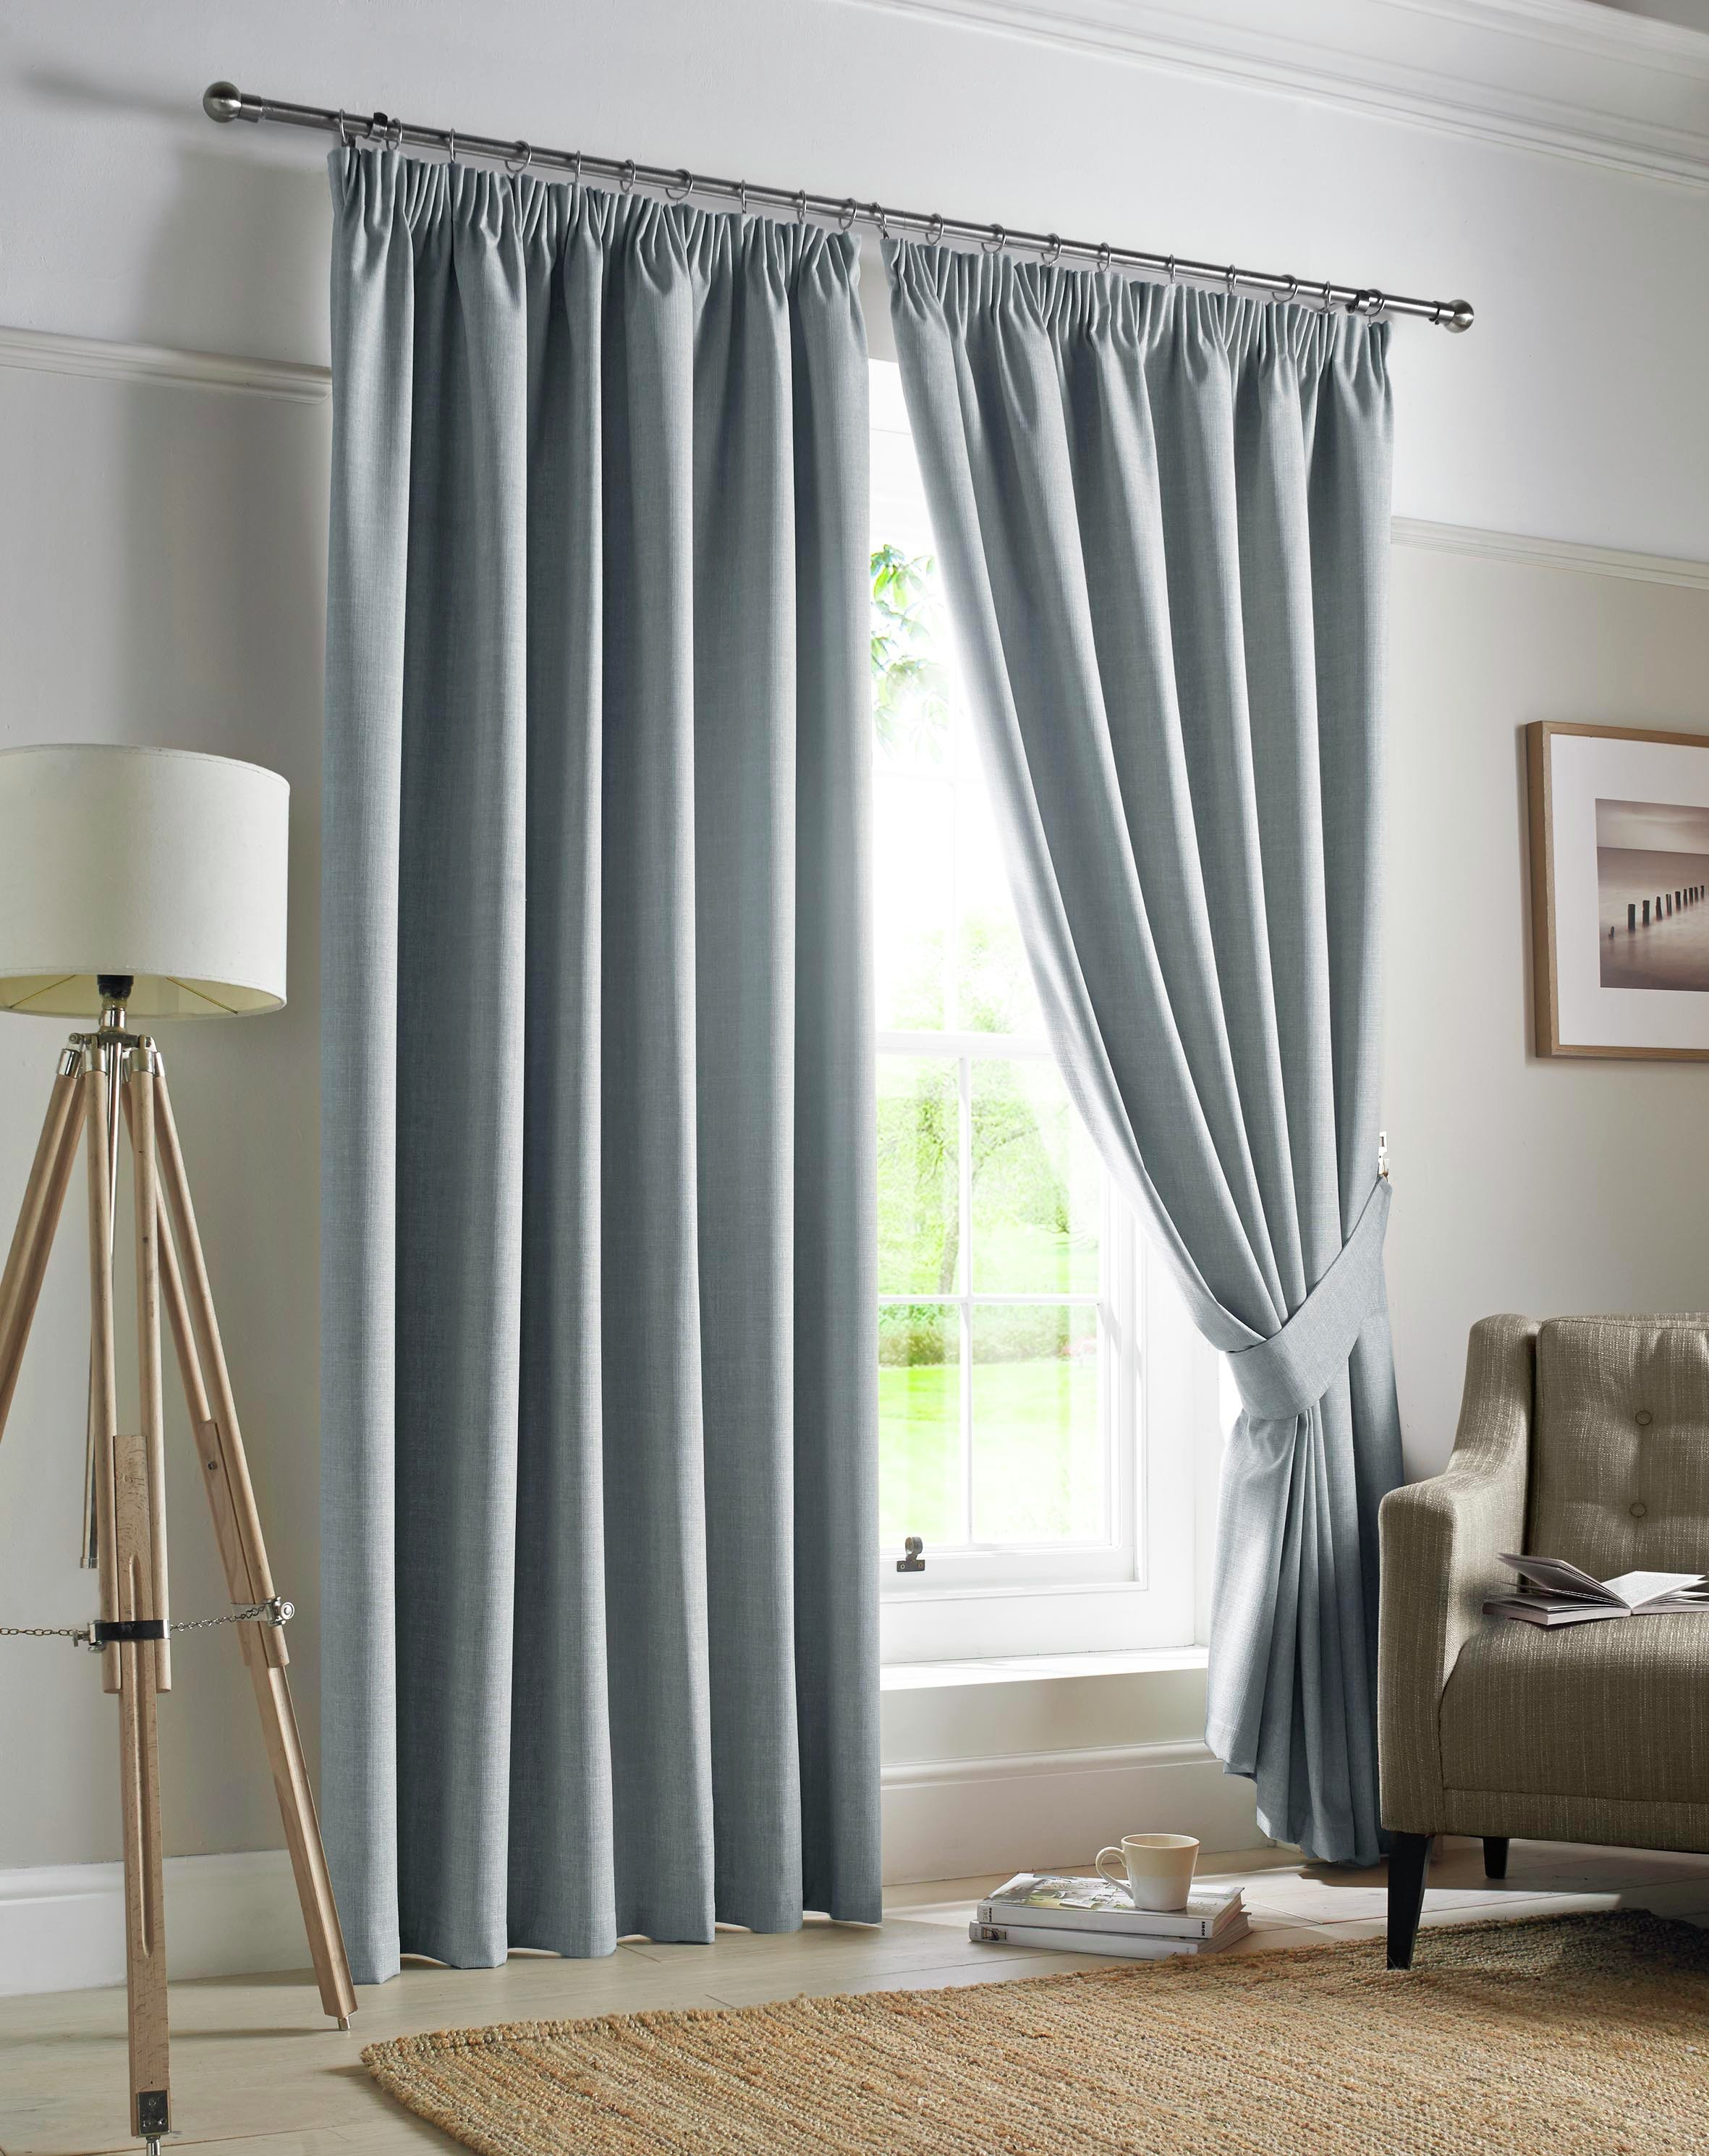 Image of Ashley Wilde Darwin Pencil Pleat Curtains - 165x229cm - Sky